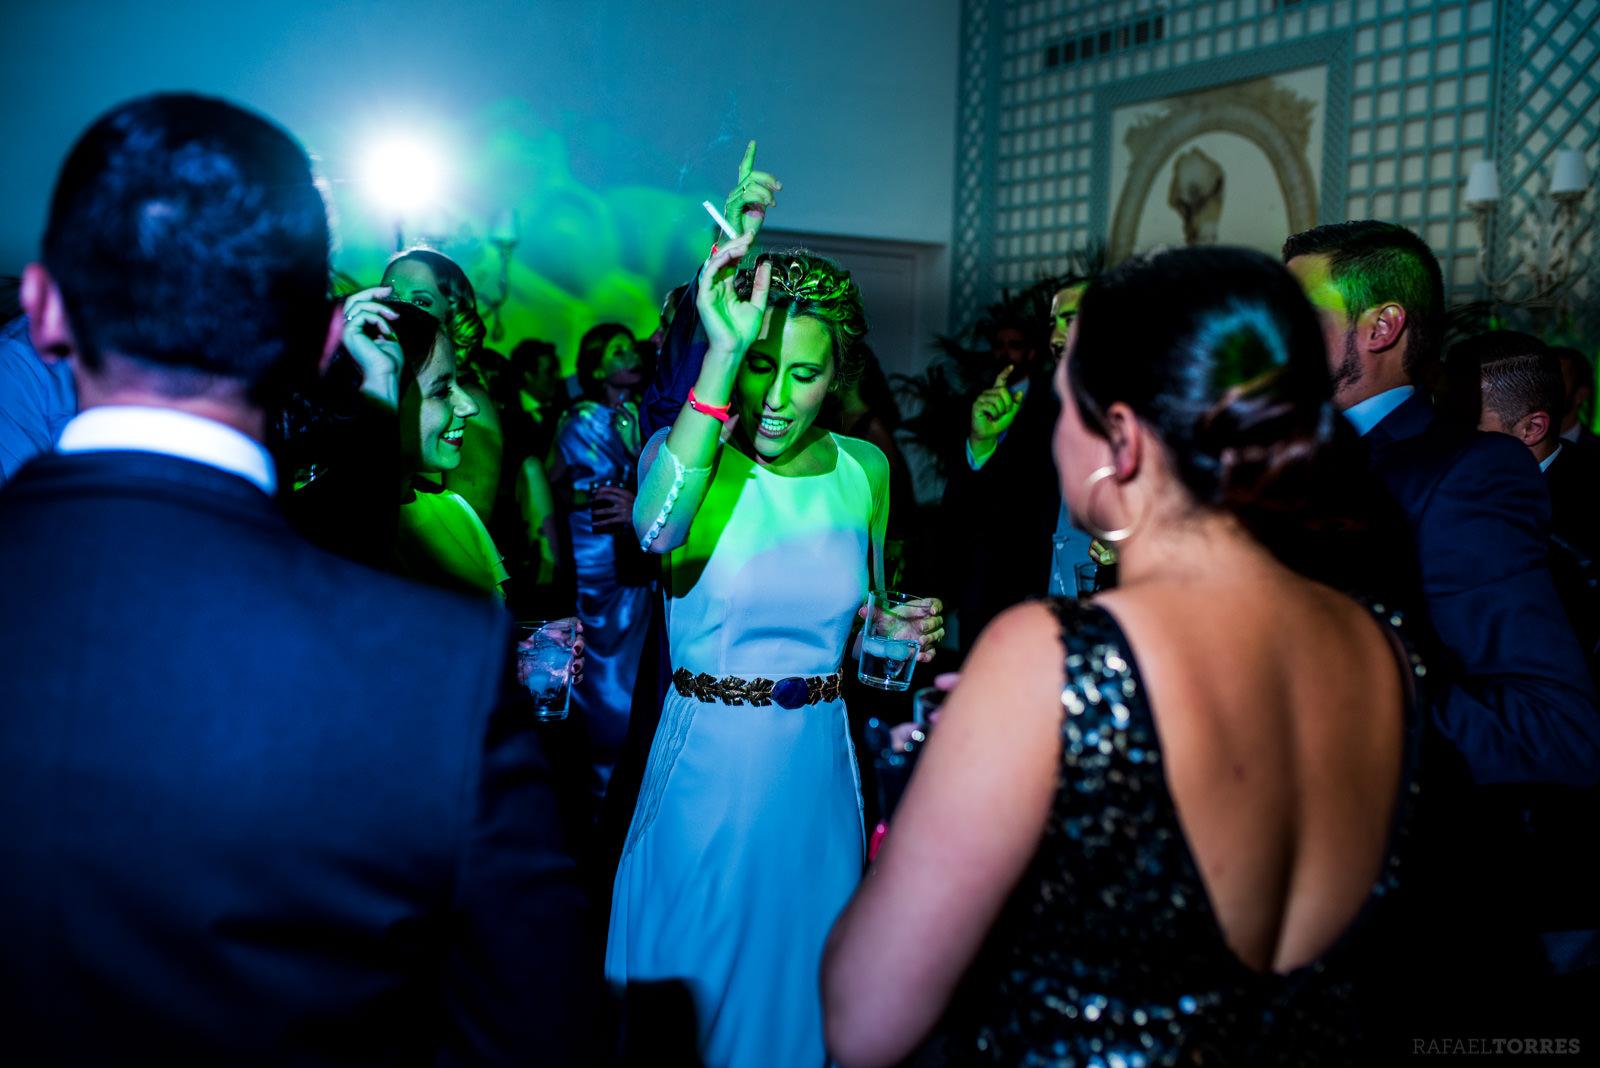 Rafael+Torres+fotografo+bodas+sevilla+madrid+barcelona+wedding+photographer+bodas+diferentes+bodaensevilla+molinillos+fotografo+hacienda+oran+alfonso+wedding+photographer-38.jpg